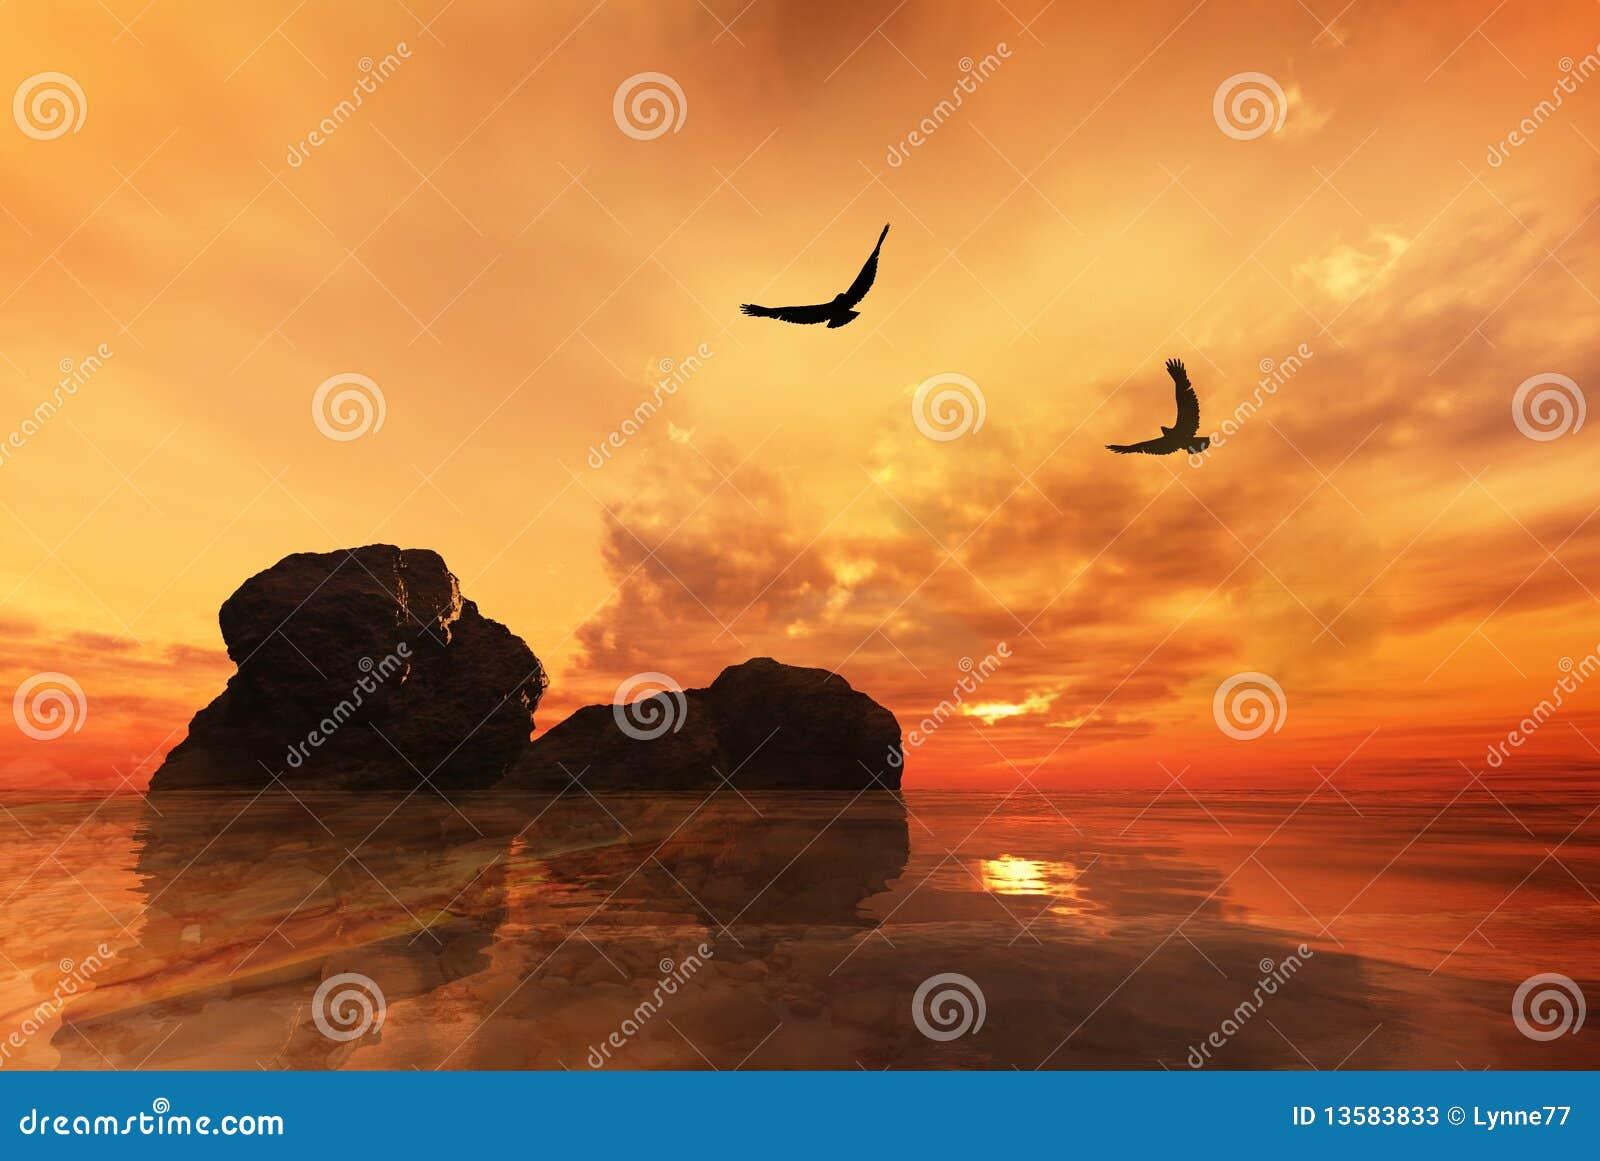 Eagles-Flugwesen